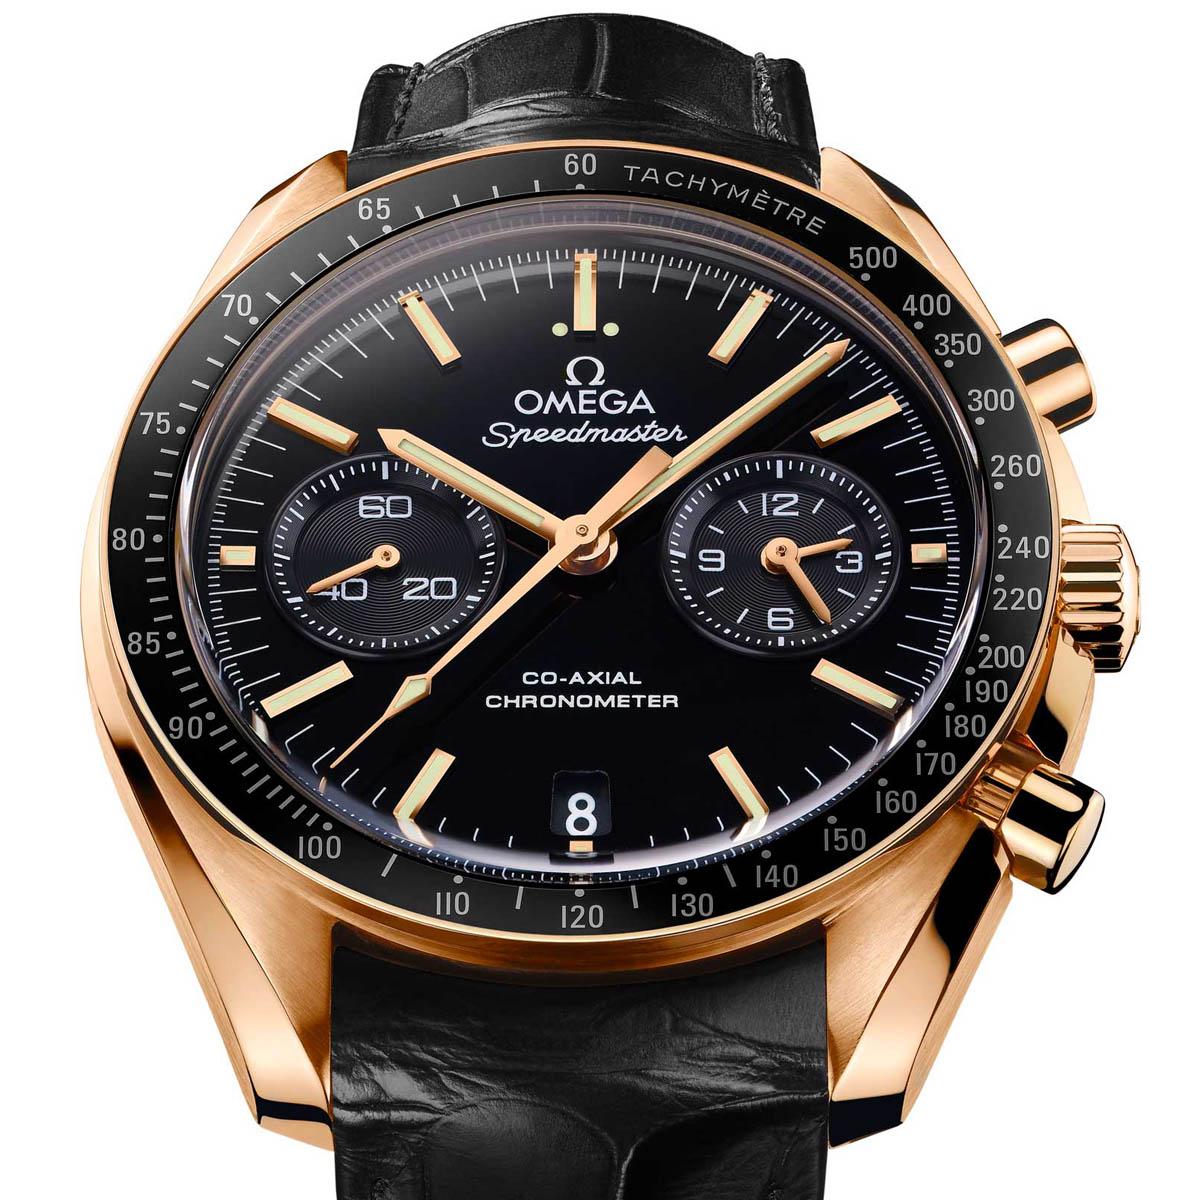 La Cote des Montres : Photo - Omega Speedmaster Moonwatch Chronographe Co-Axial Calibre 9301